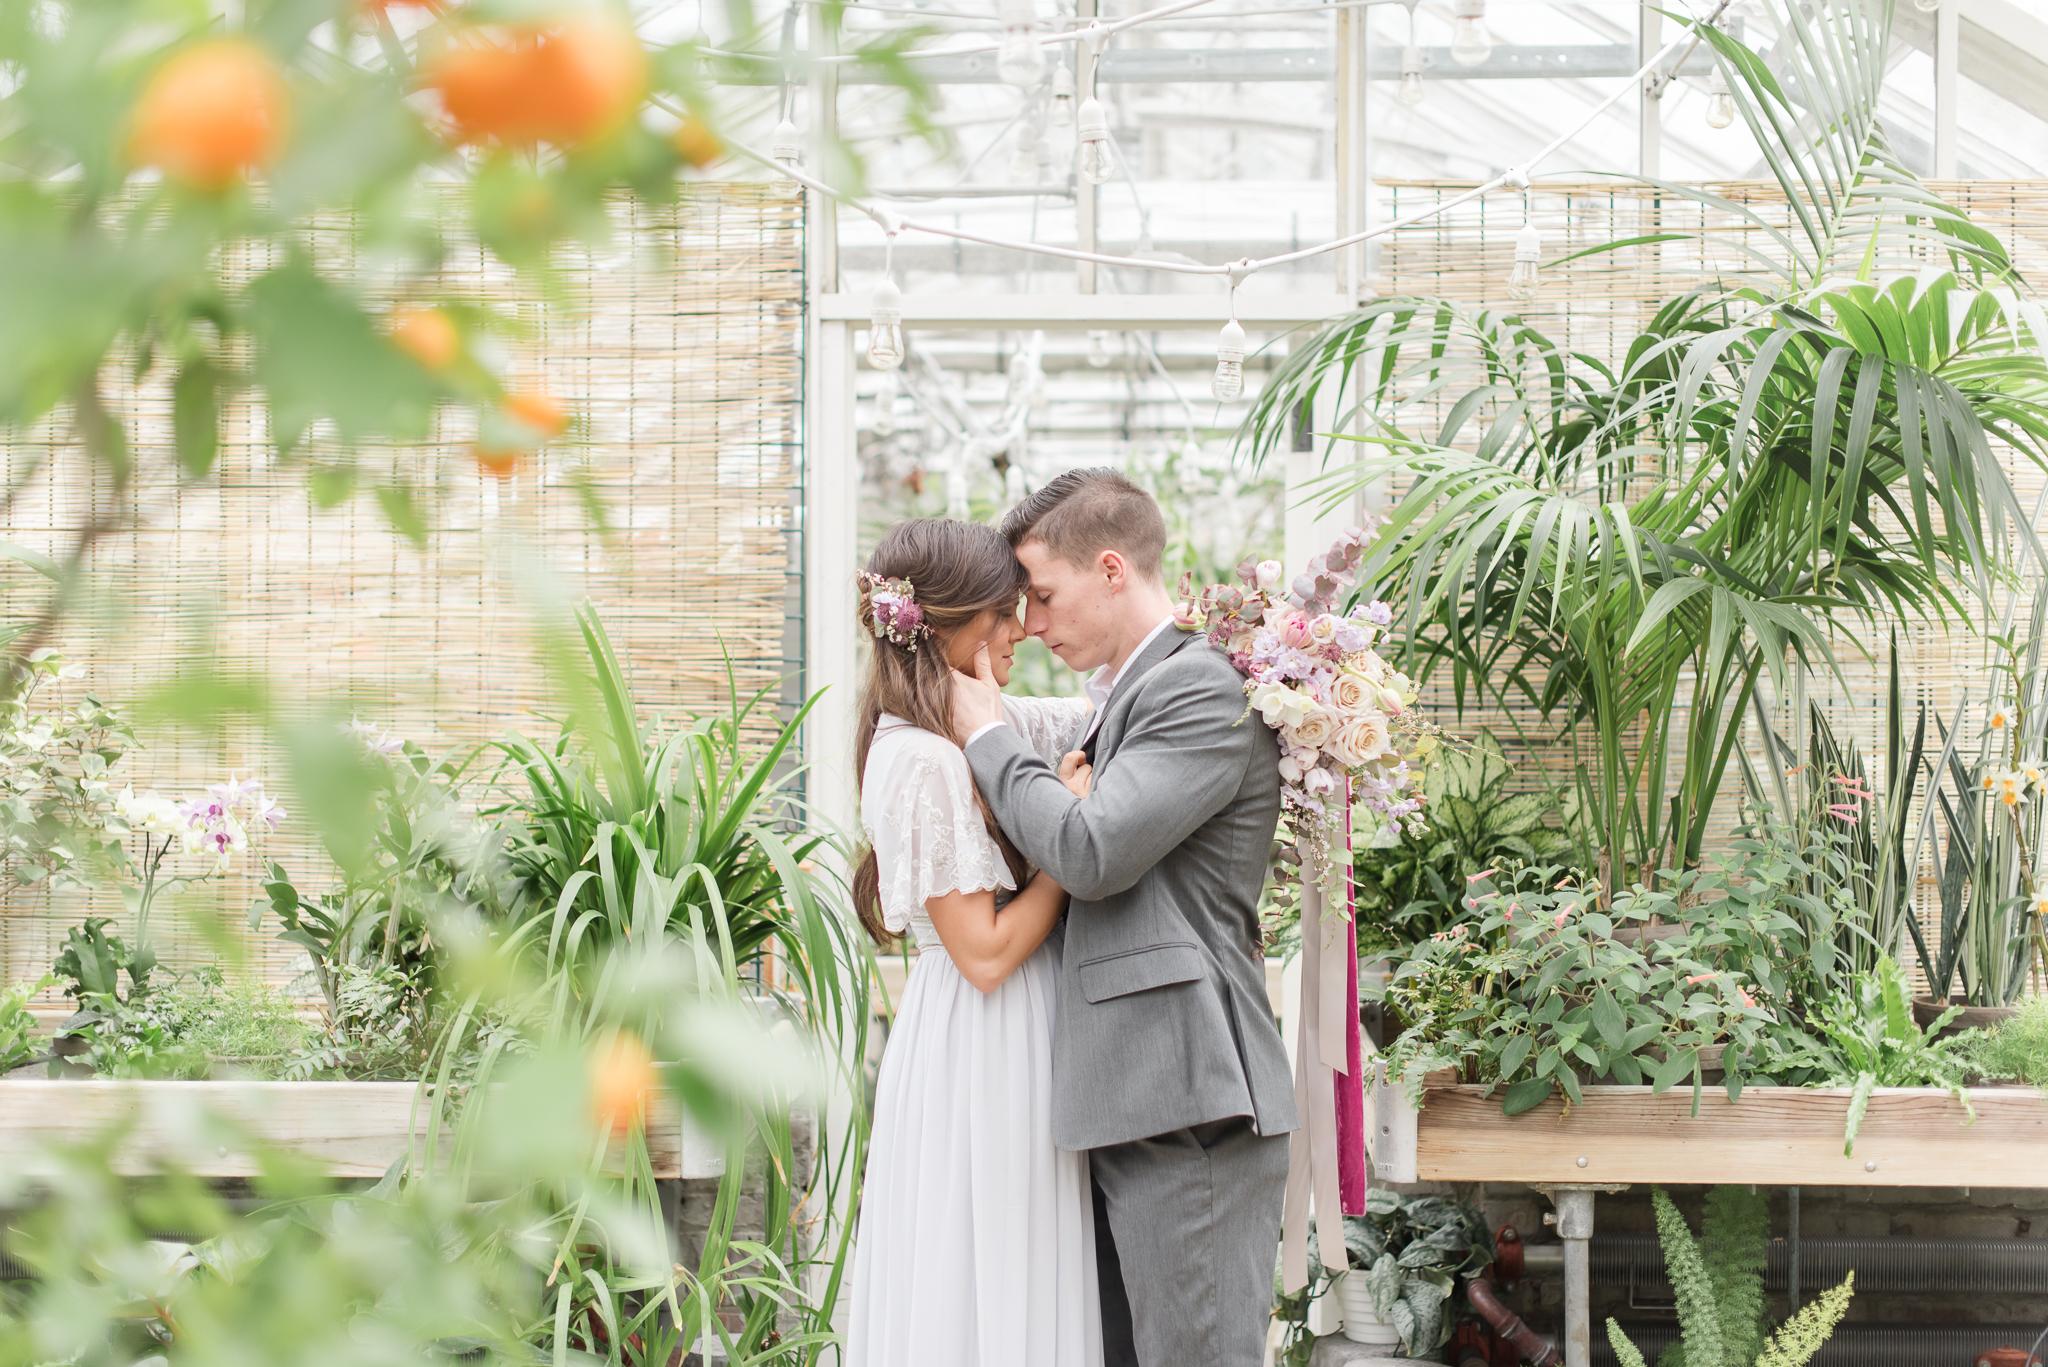 Newfields Engagement Session IMA Indianapolis Museum of Art Wedding Photos Photographer-15.jpg